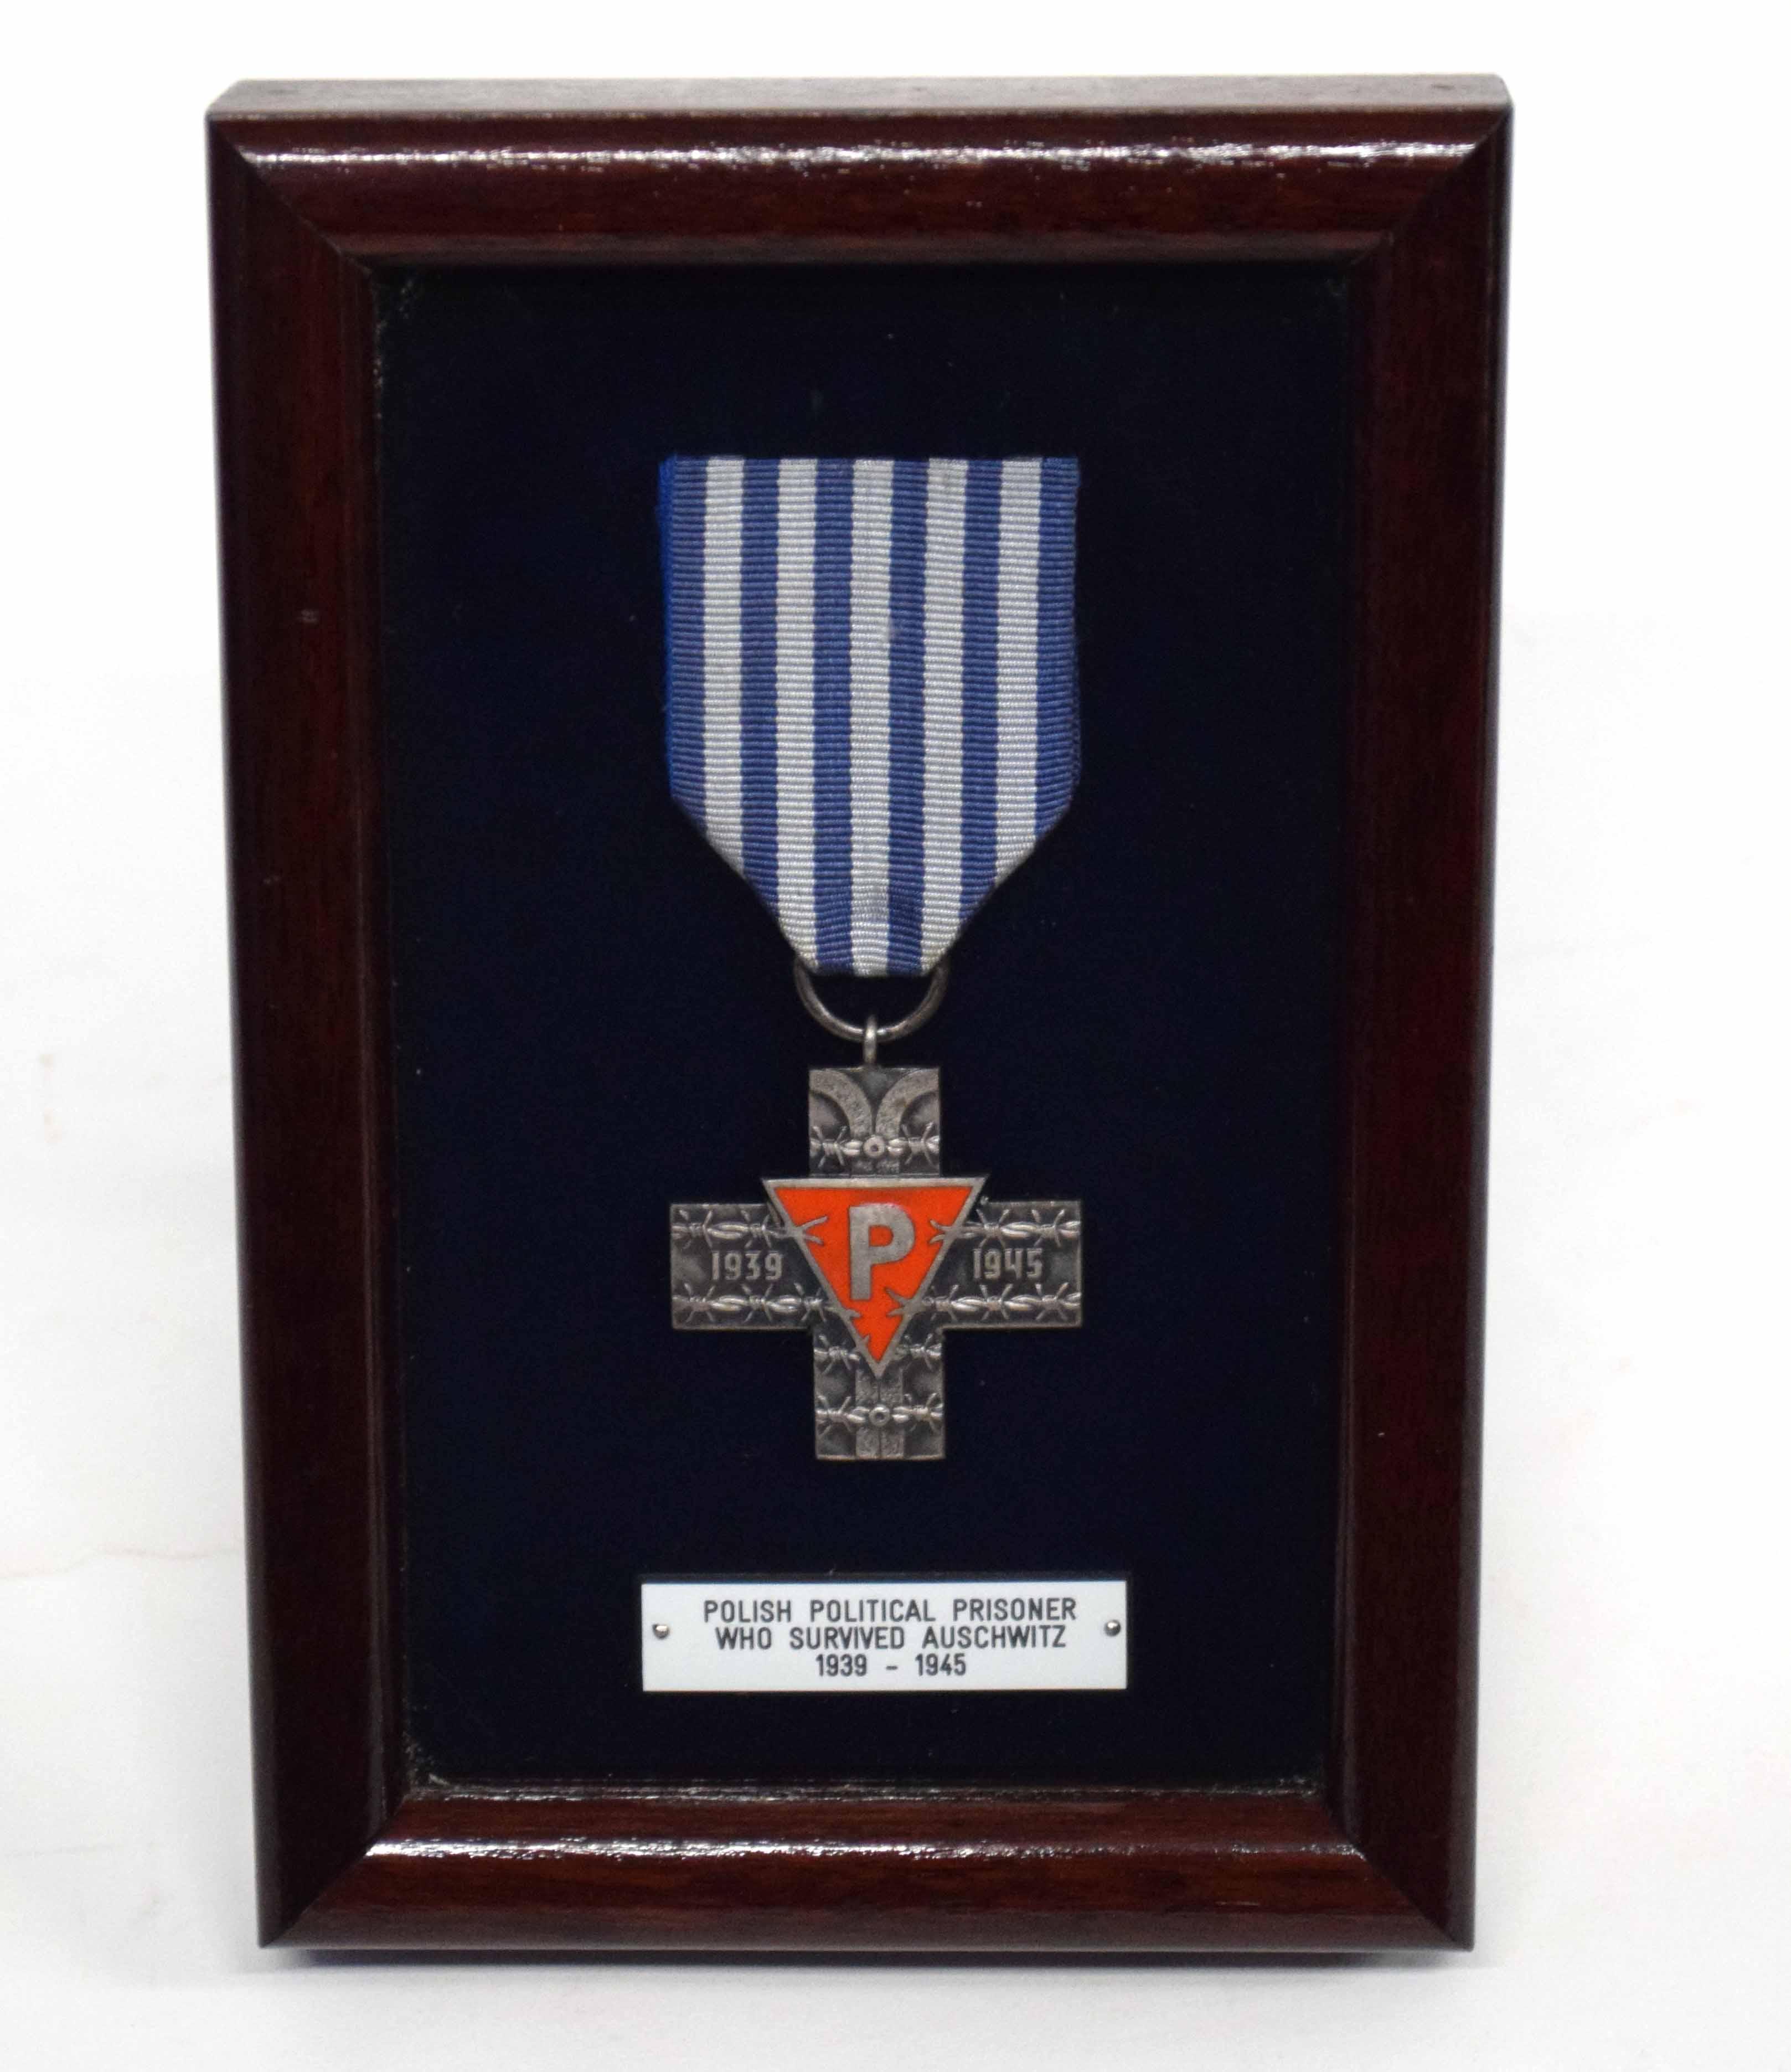 Holocaust survivor medal - Polish political prisoner who survived Auschwitz 1939-1945, displayed